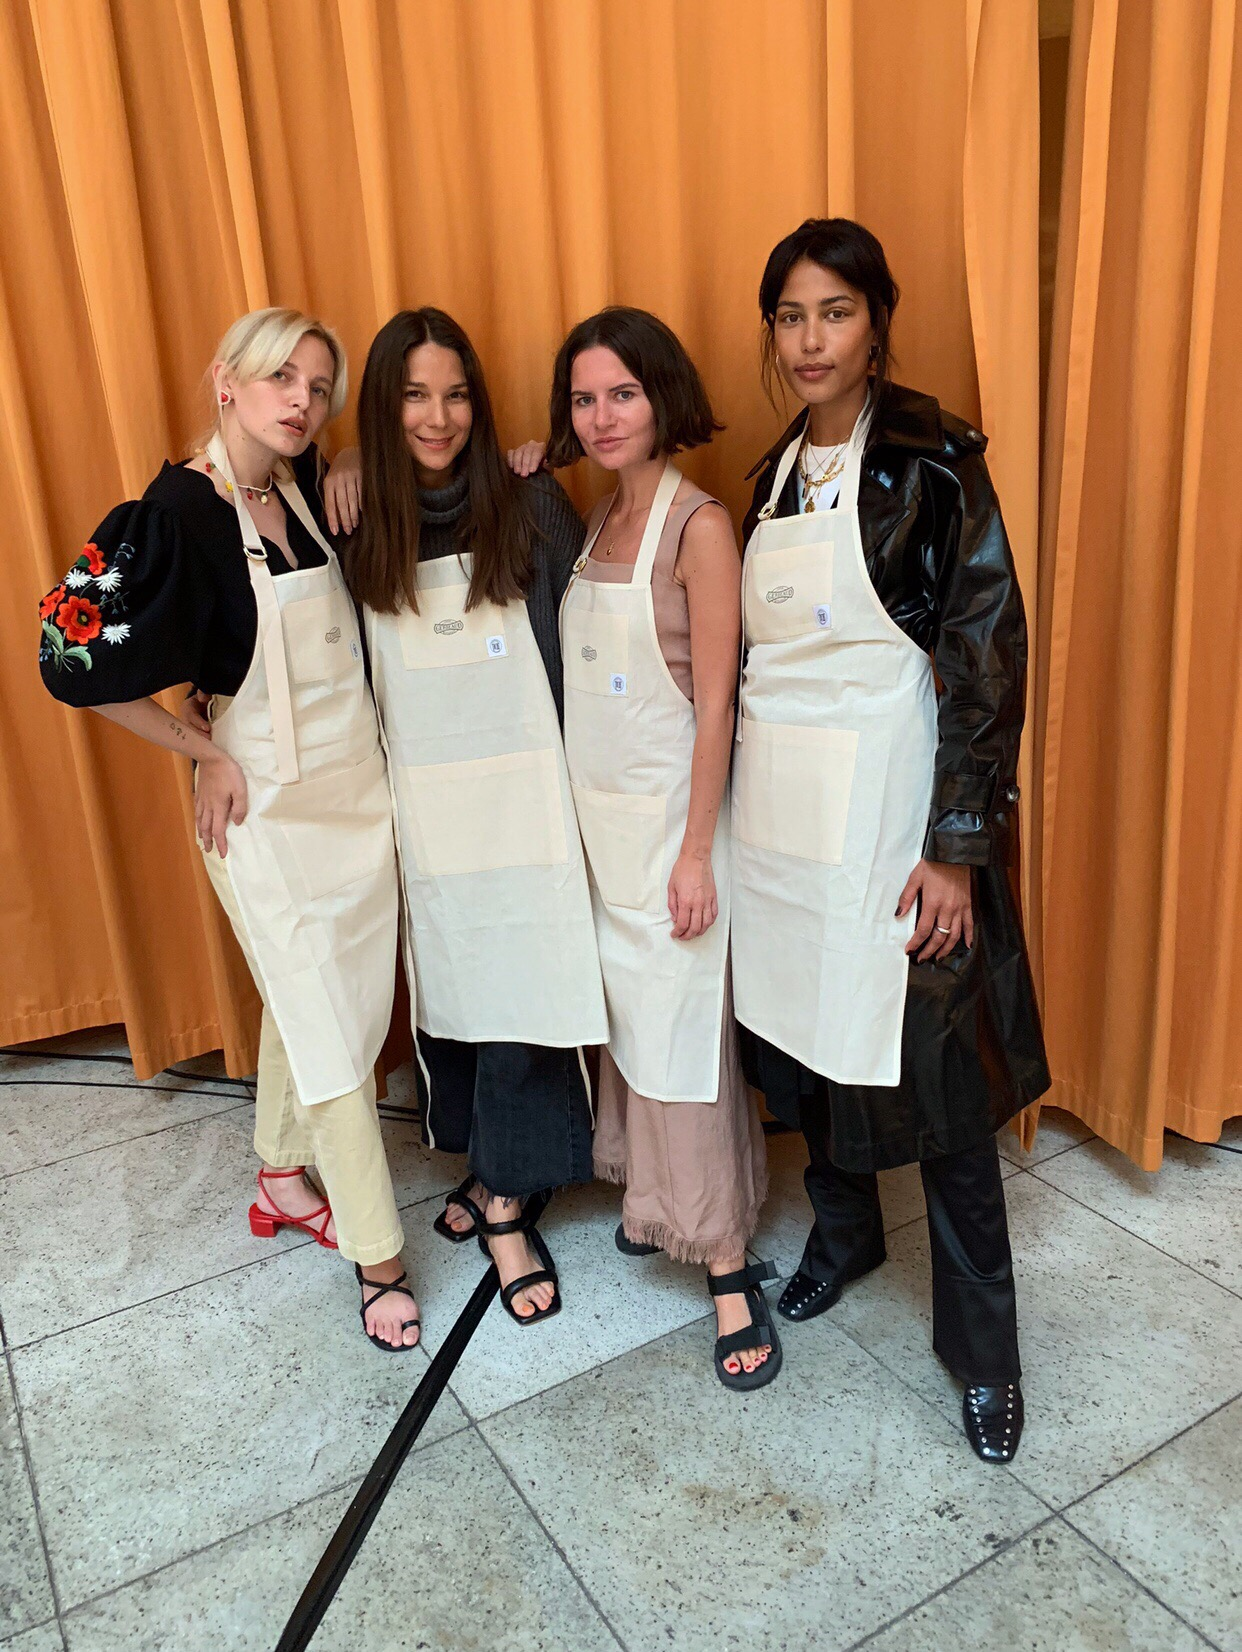 Marfa Creme Wide Leg Jeans | €290   Yola Puffed Sandals | €32 0  Moun Western Strap Dress | €580   Ambar Vinyl Trench Coat | €870